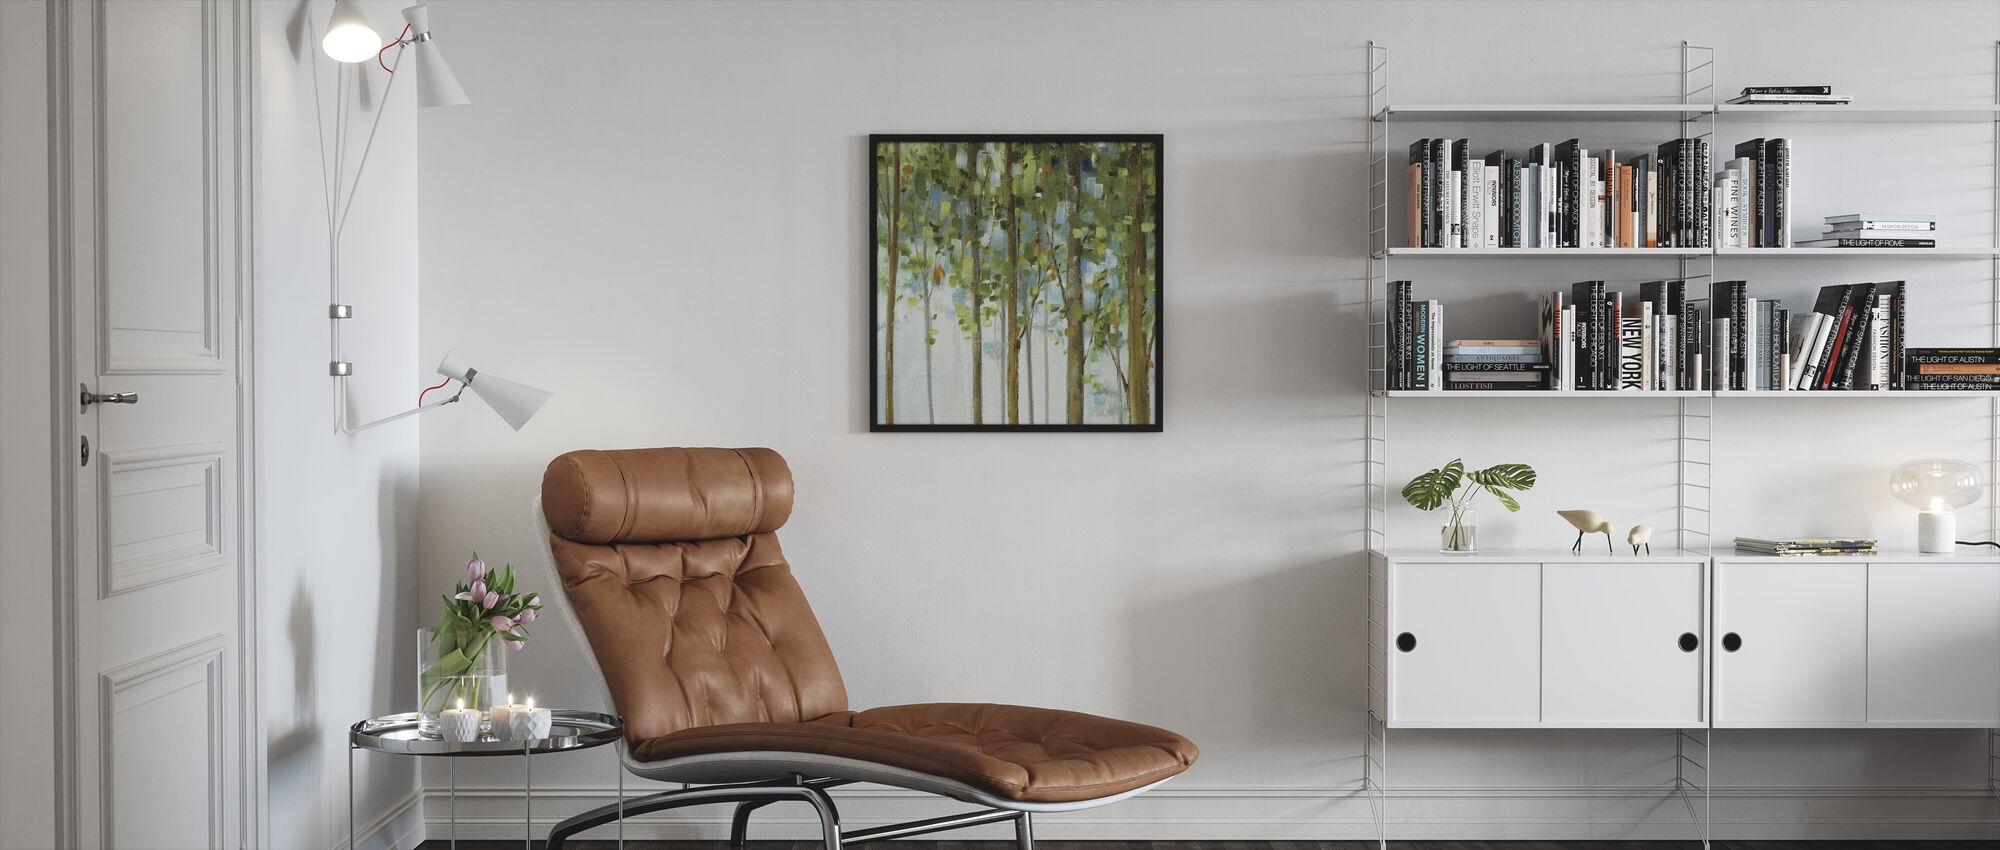 Forest Study 2 - Framed print - Living Room